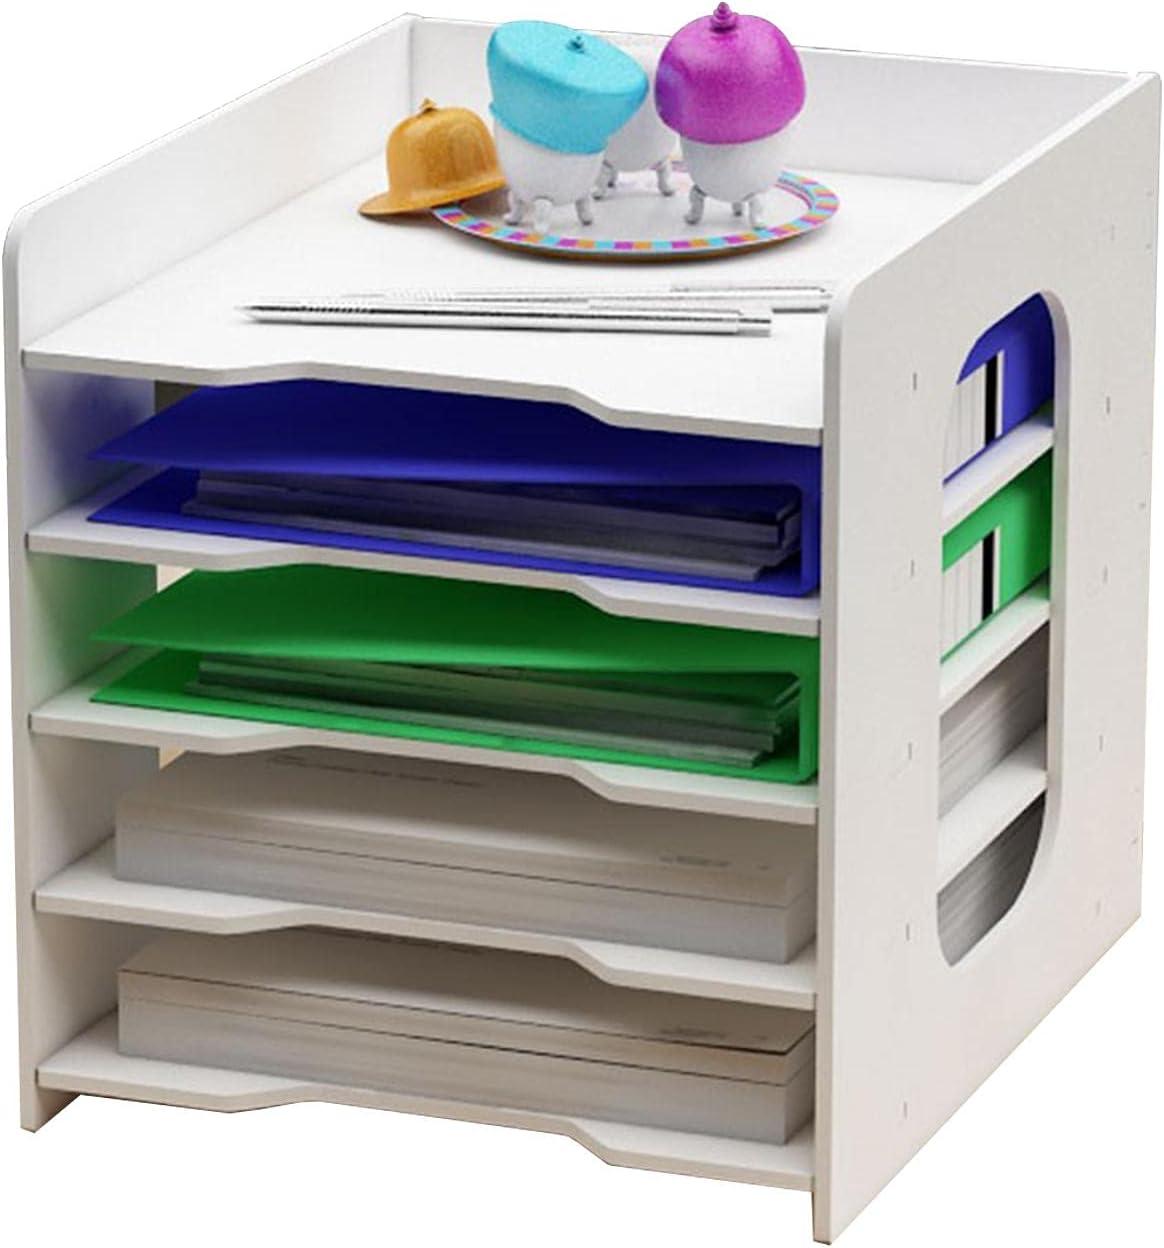 BWWNBY Desk File Sorter Organiser Tray Quantity limited Rack Offic Holder Max 51% OFF Storage